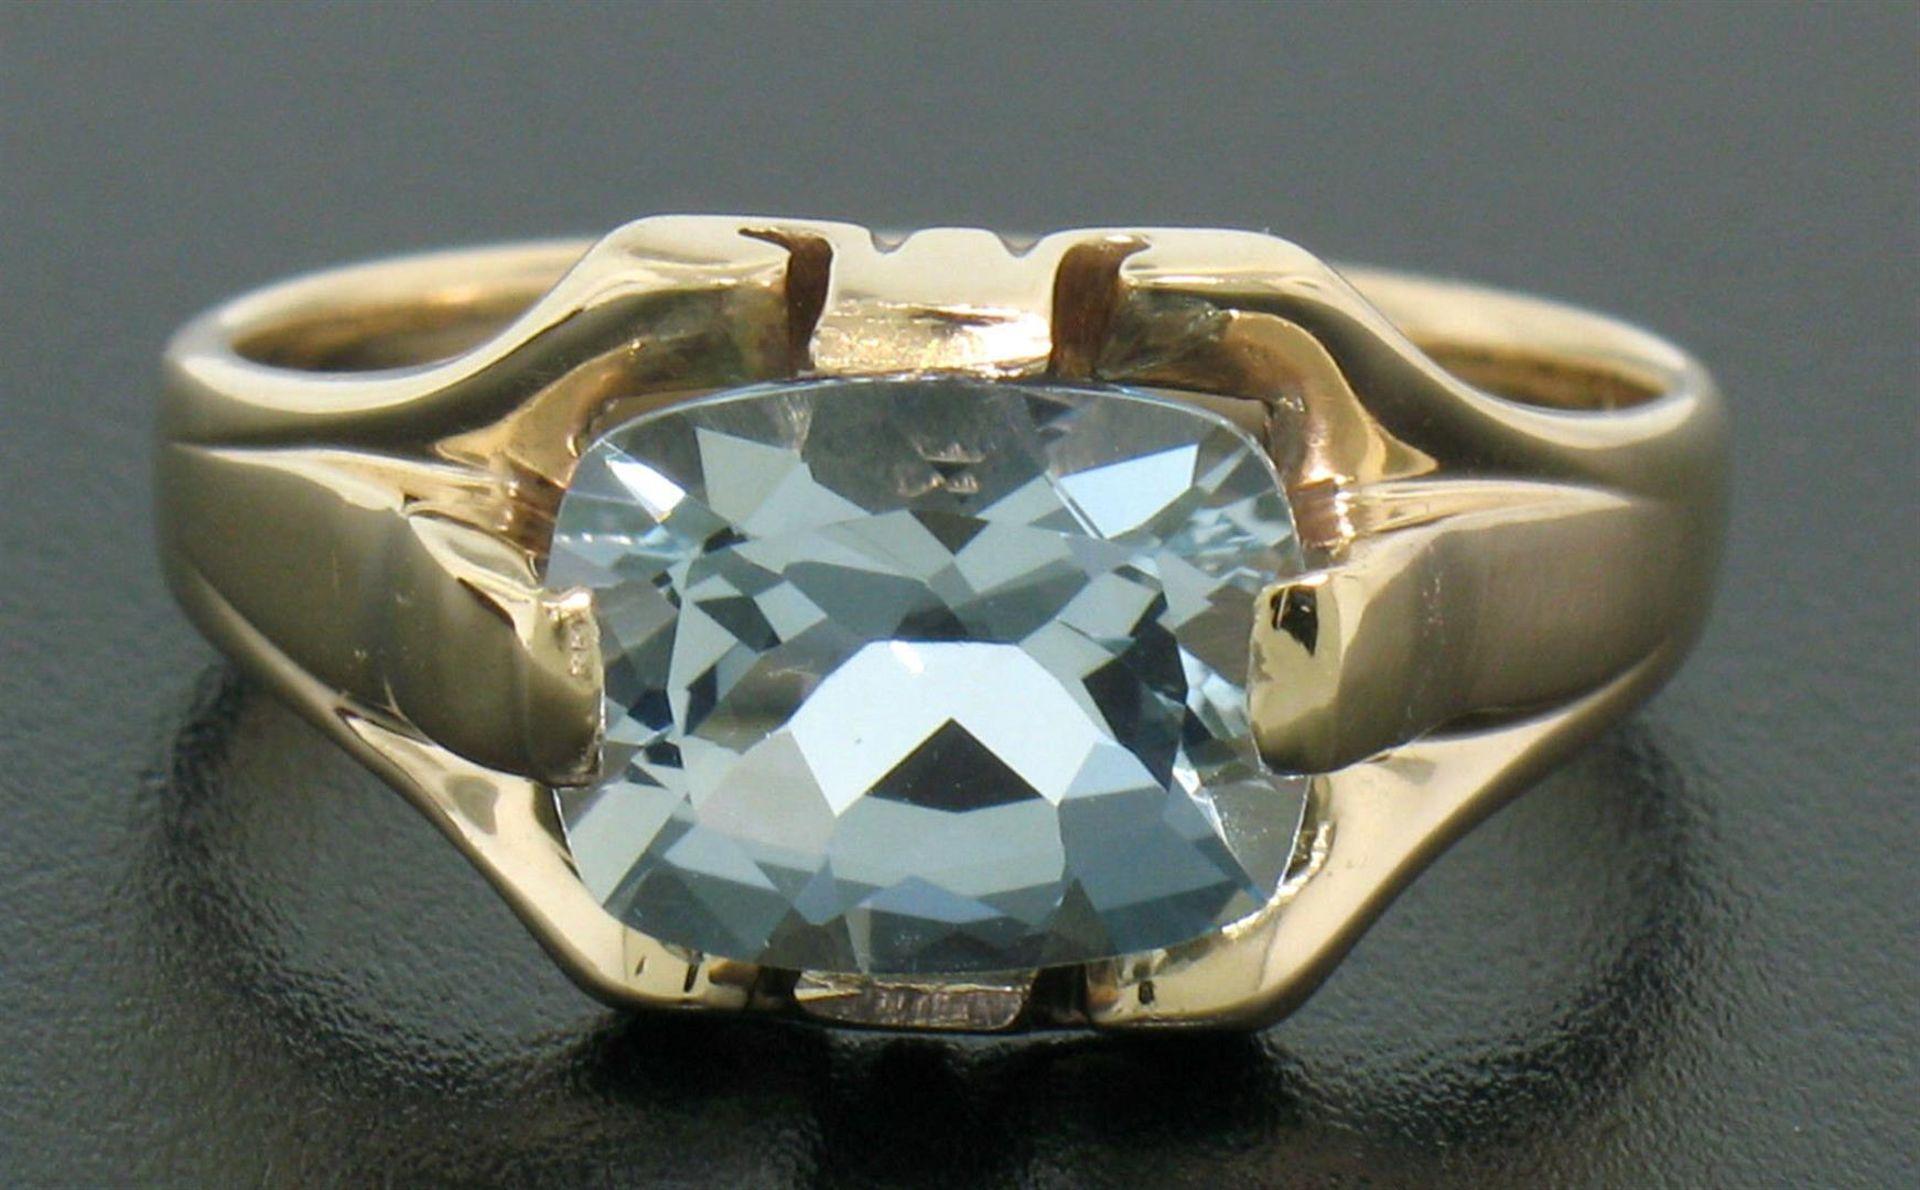 10k Gold Cushion Cut Horizontal Aquamarine Solitaire Ladies Ring - Image 3 of 4